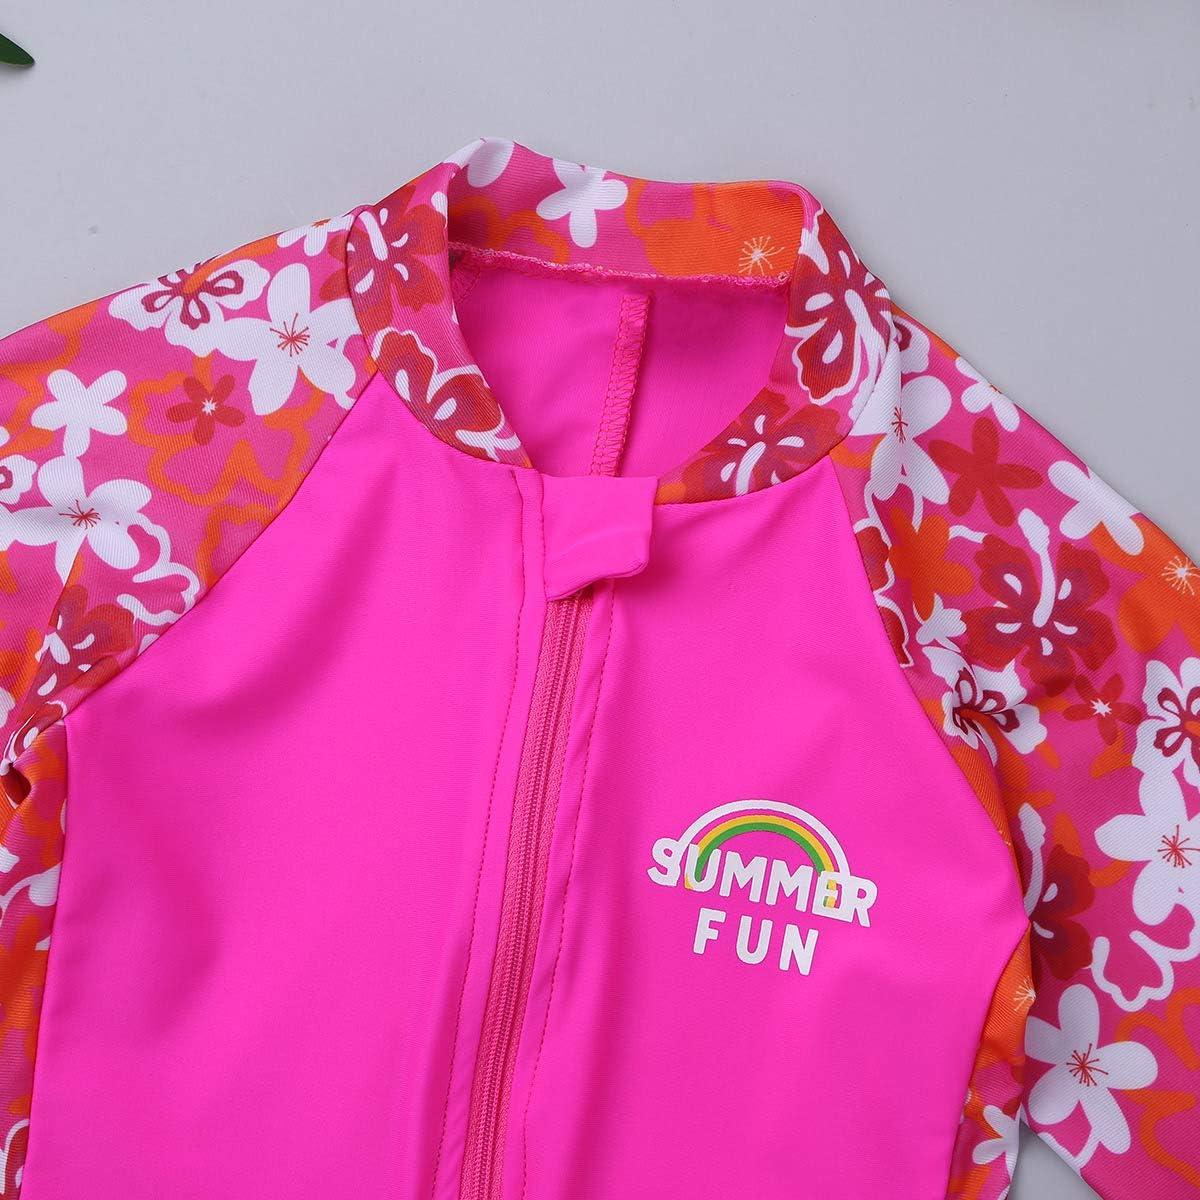 YiZYiF Kids Girls Full Body Swimsuit UV Sun Protective One-Piece Long Sleeve Floral Sunsuit Rashguard Sets